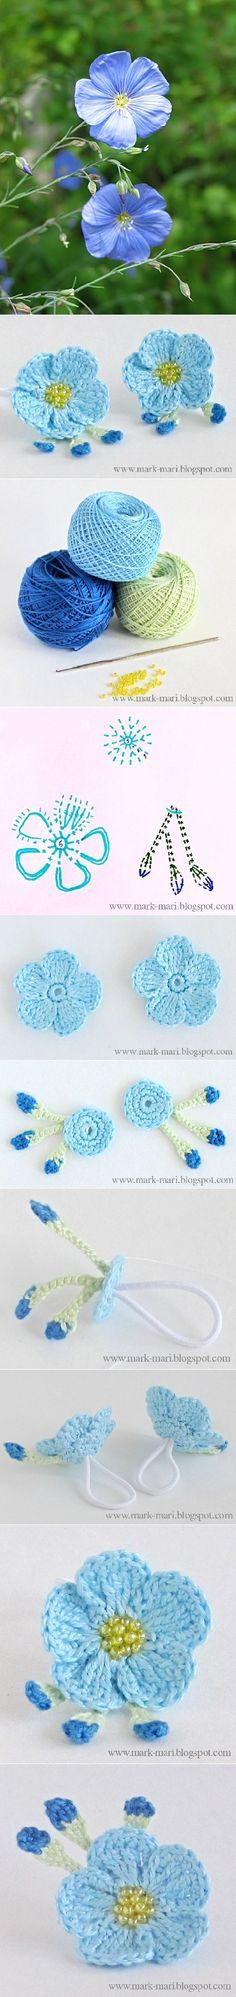 Crochet Flax-Blossoms